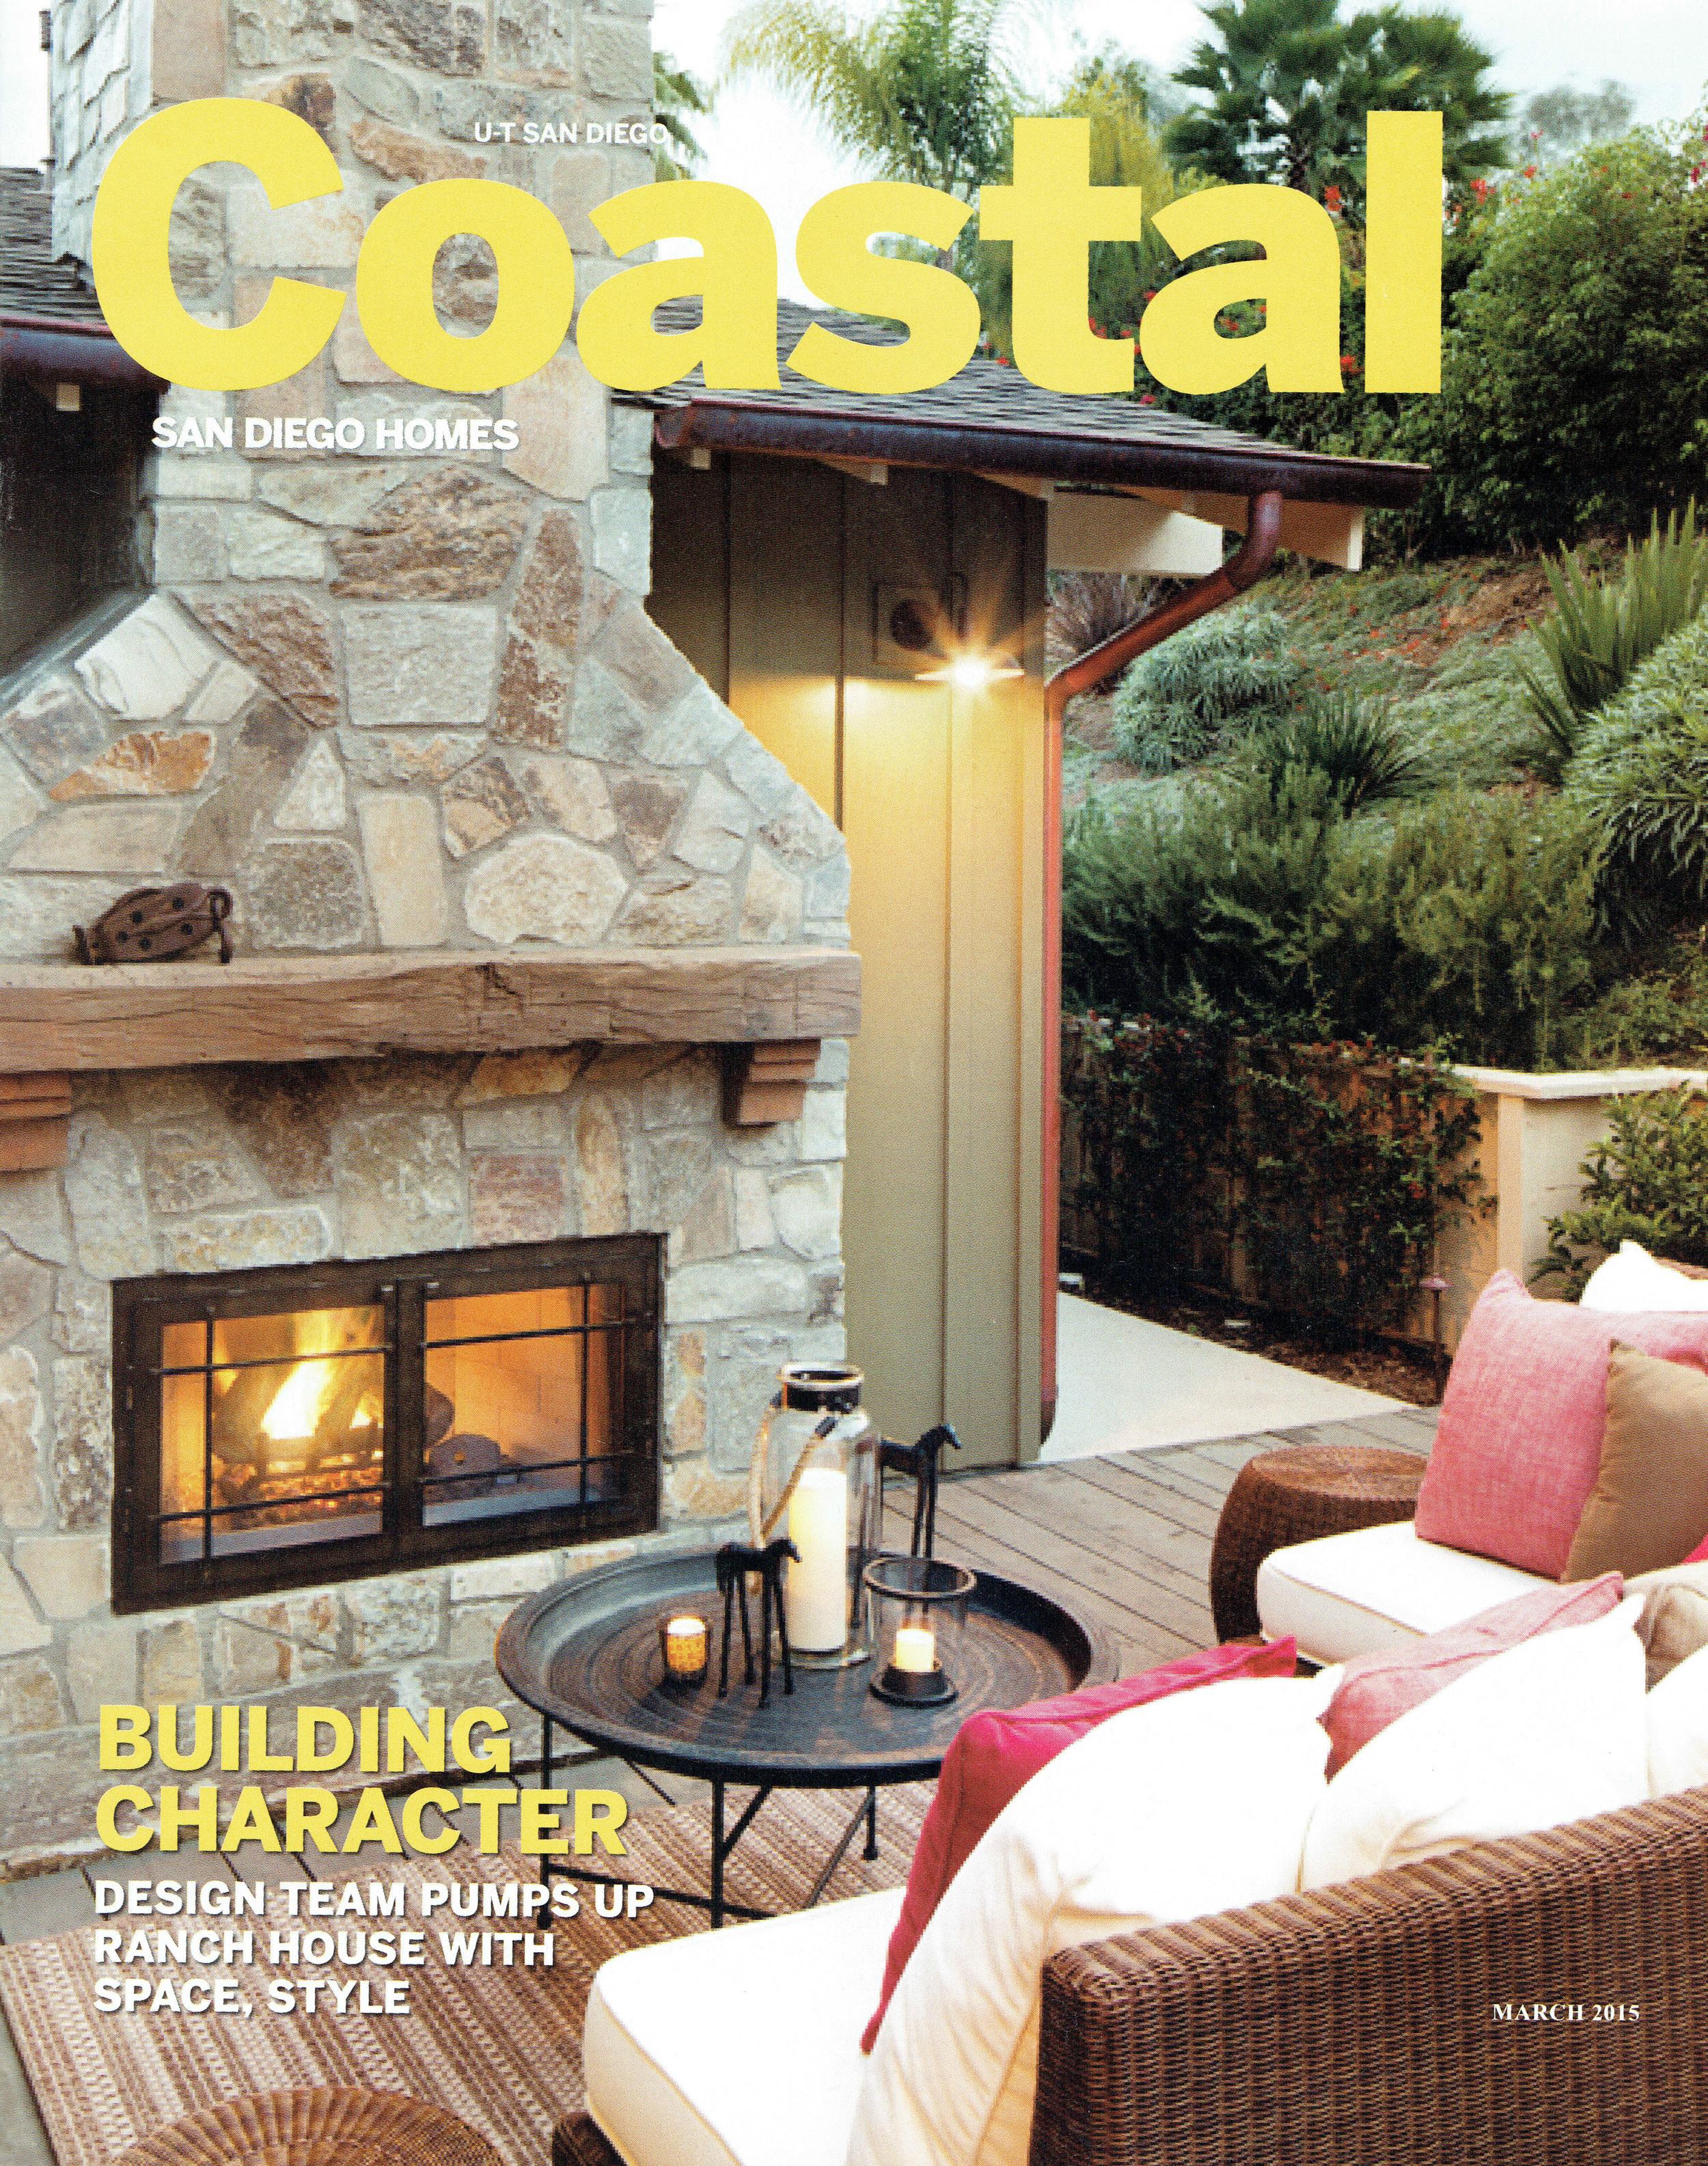 Mertz Coastal Homes Article.jpg